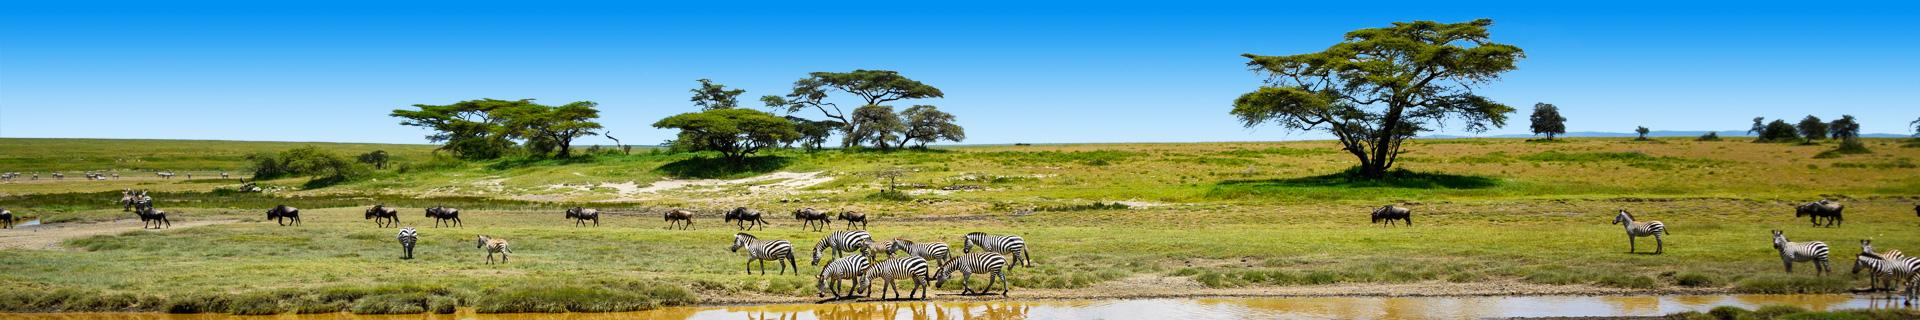 Natuur en zebras in Tanzania